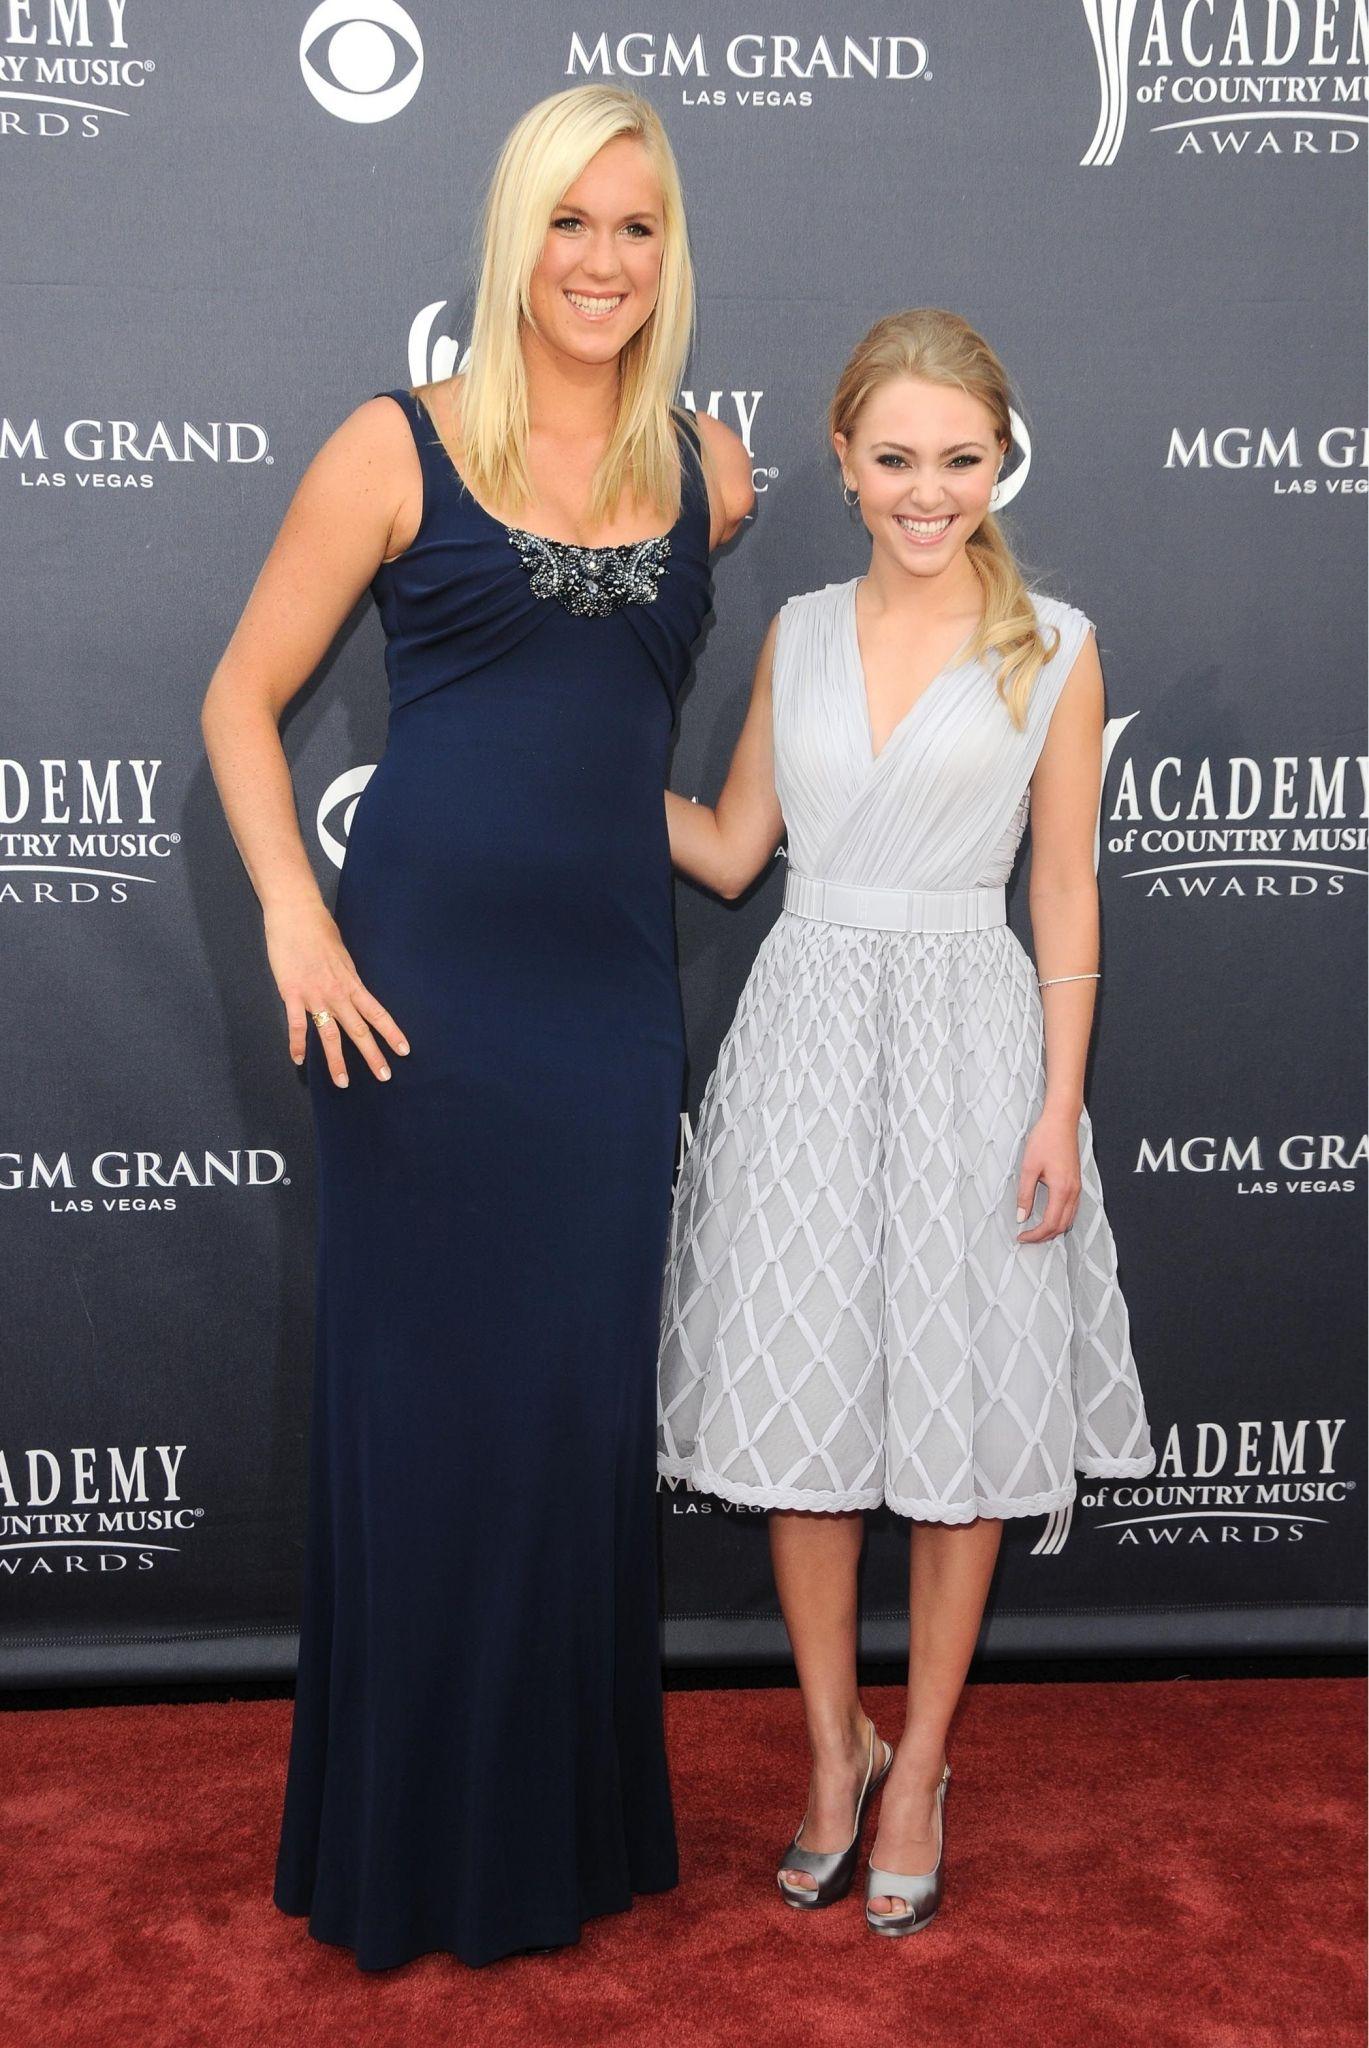 great dresses worn by Bethany Hamilton & AnnaSophia Robb | Tall girl  fashion, Tall girl fashion outfits, Tall girl fashion summer